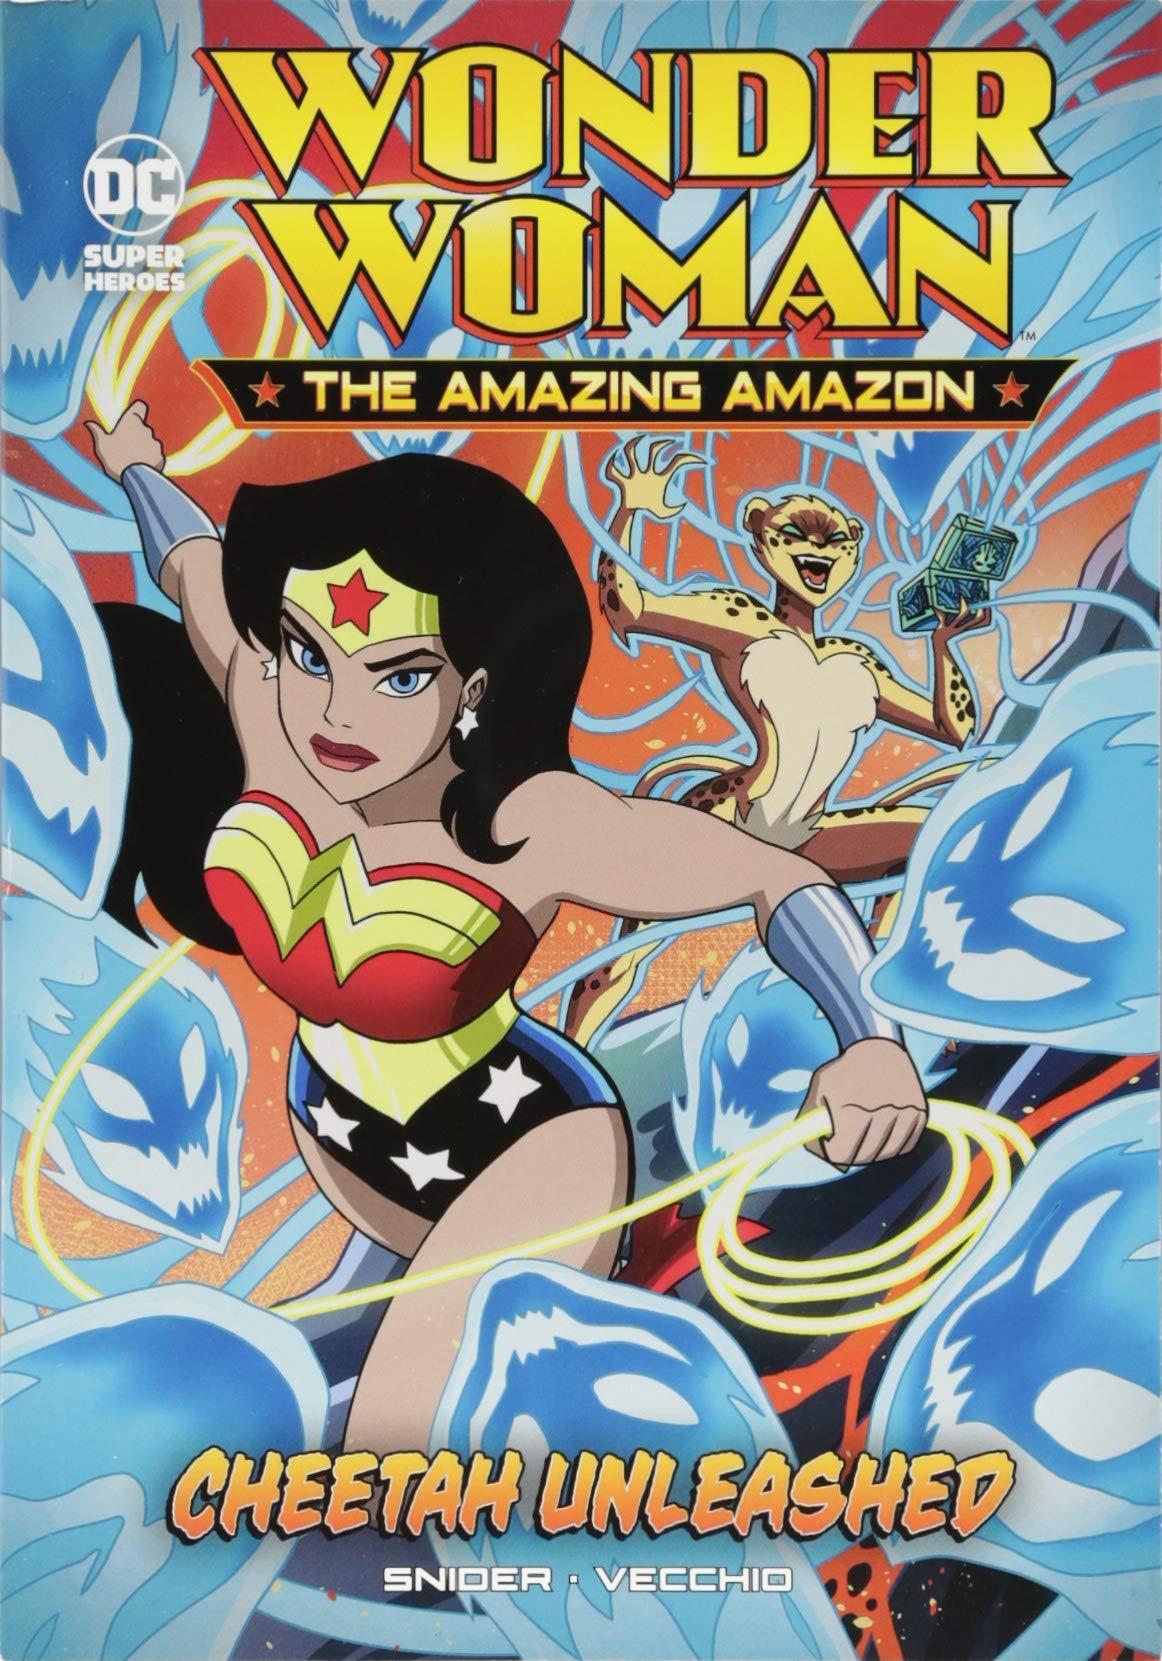 Cheetah Unleashed (Wonder Woman the Amazing Amazon) ebook